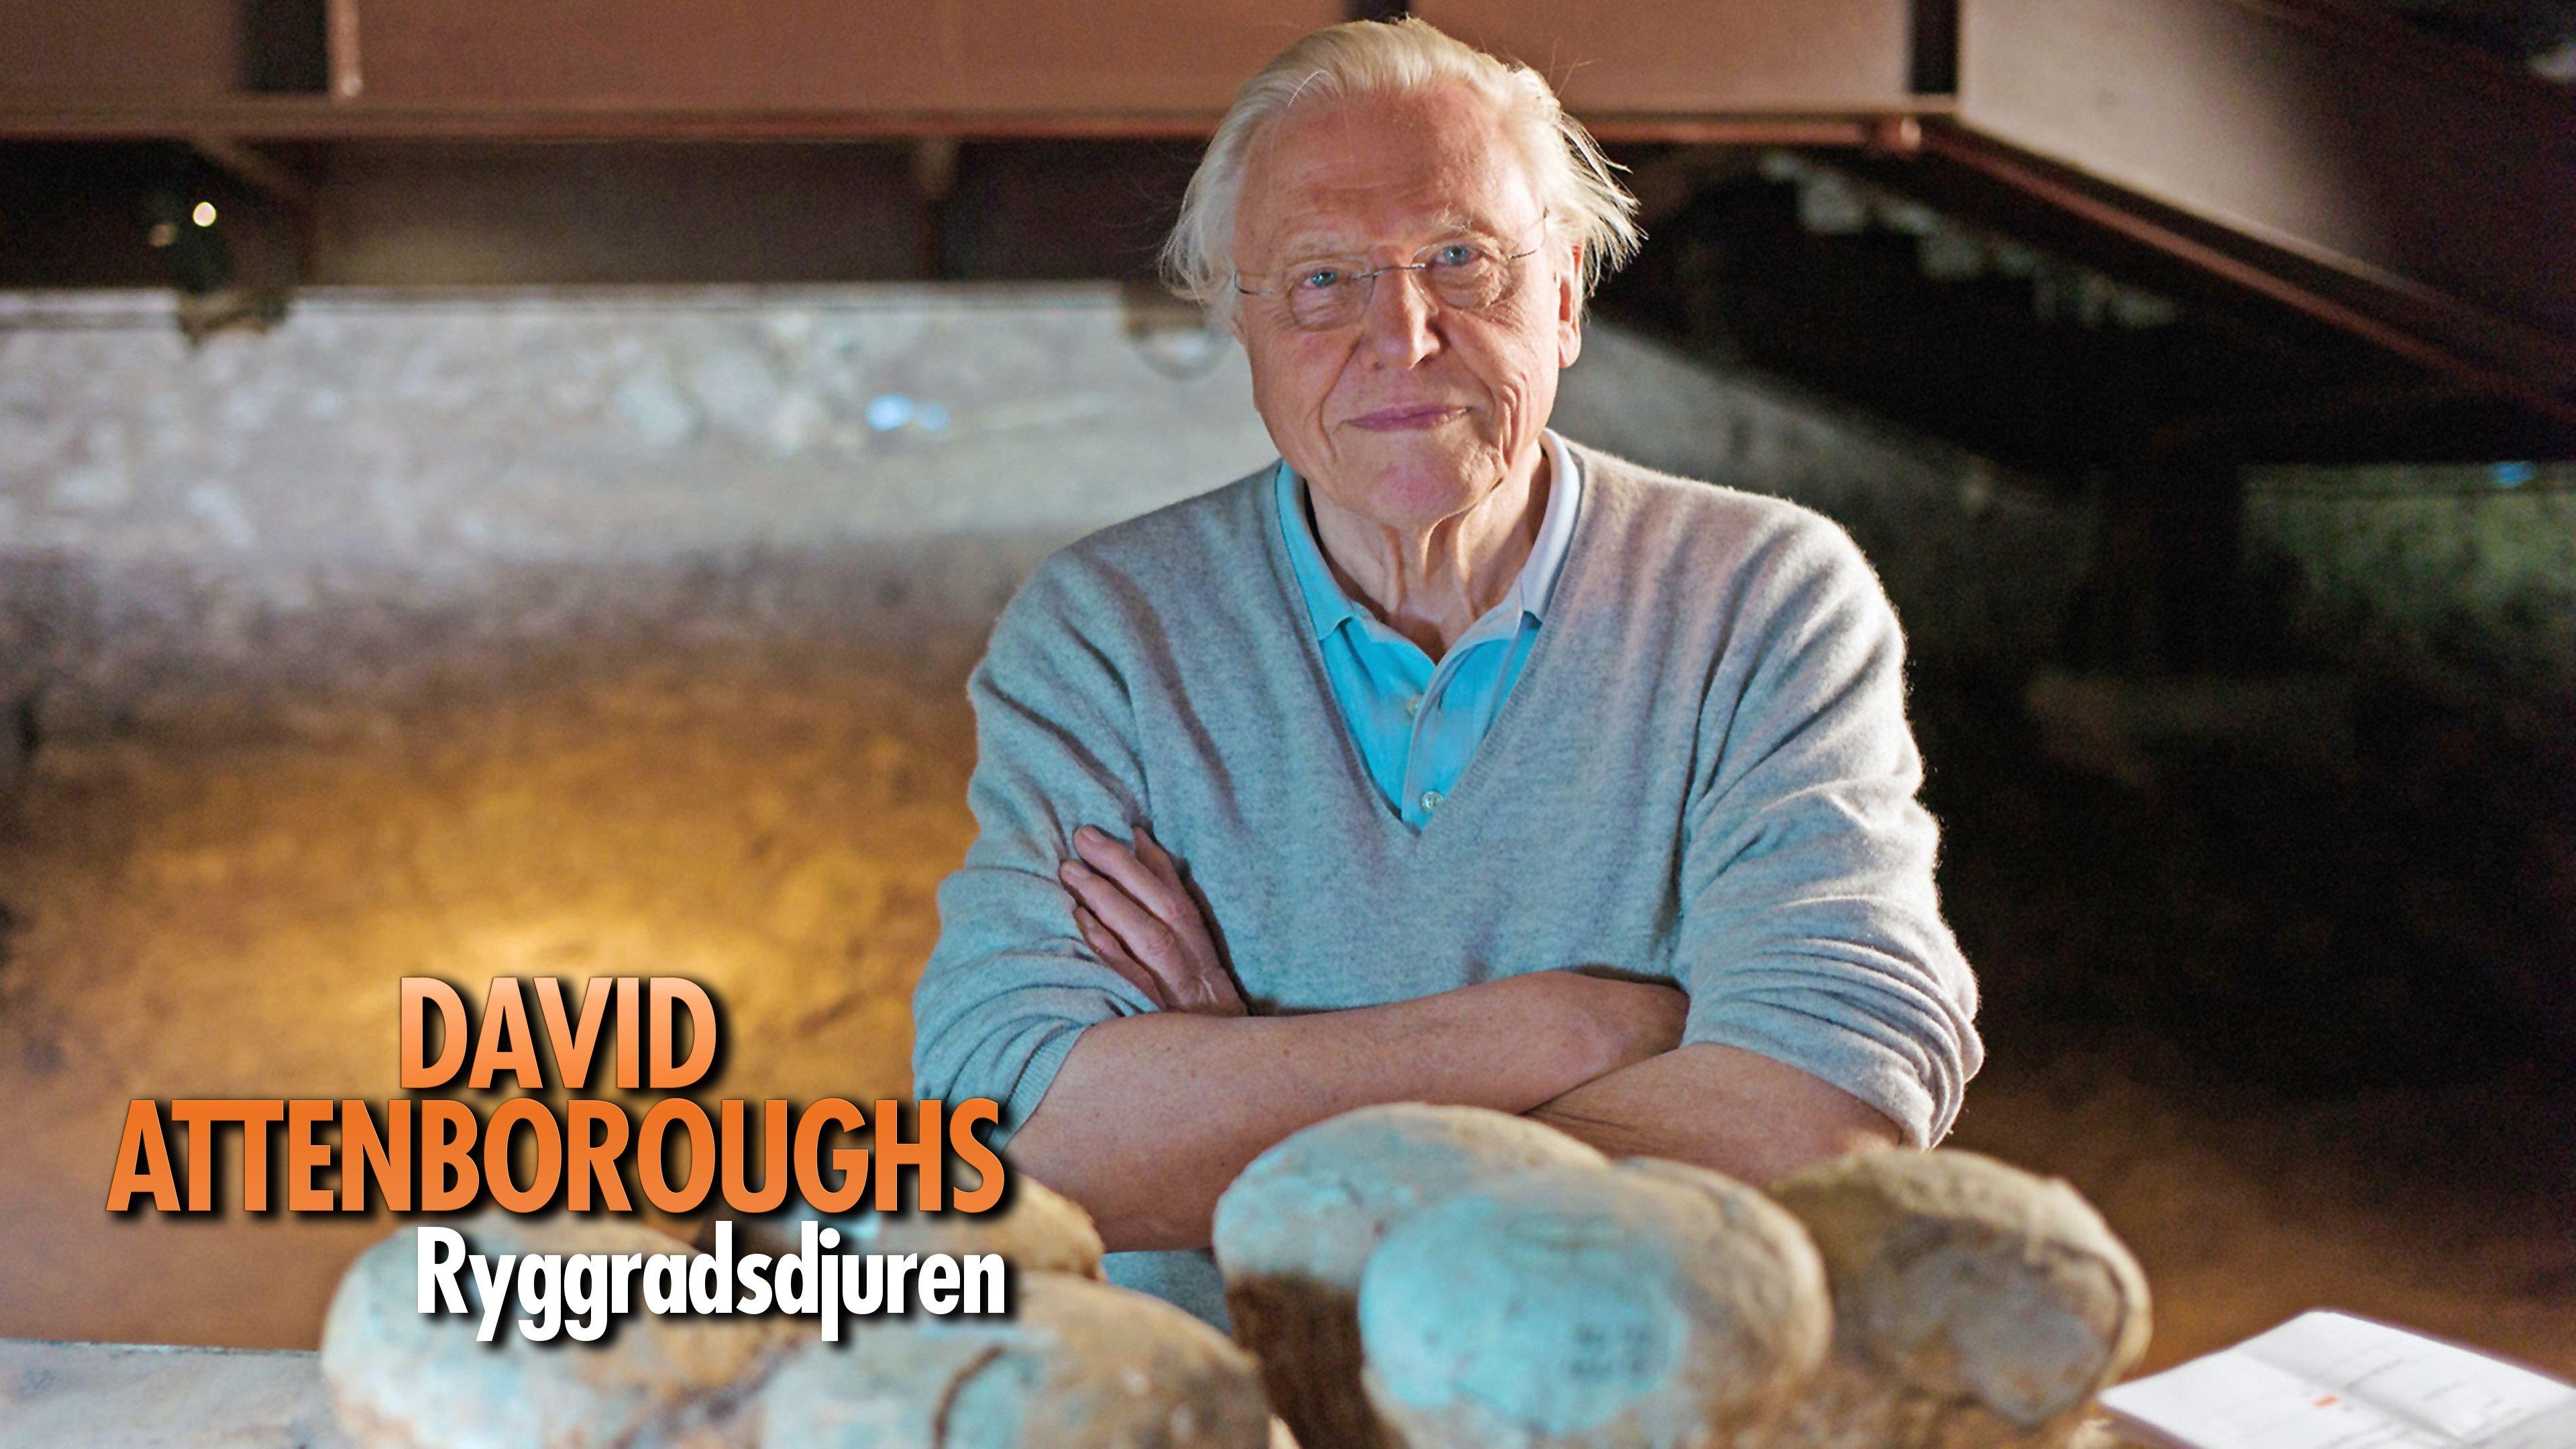 David Attenboroughs Ryggradsdjuren